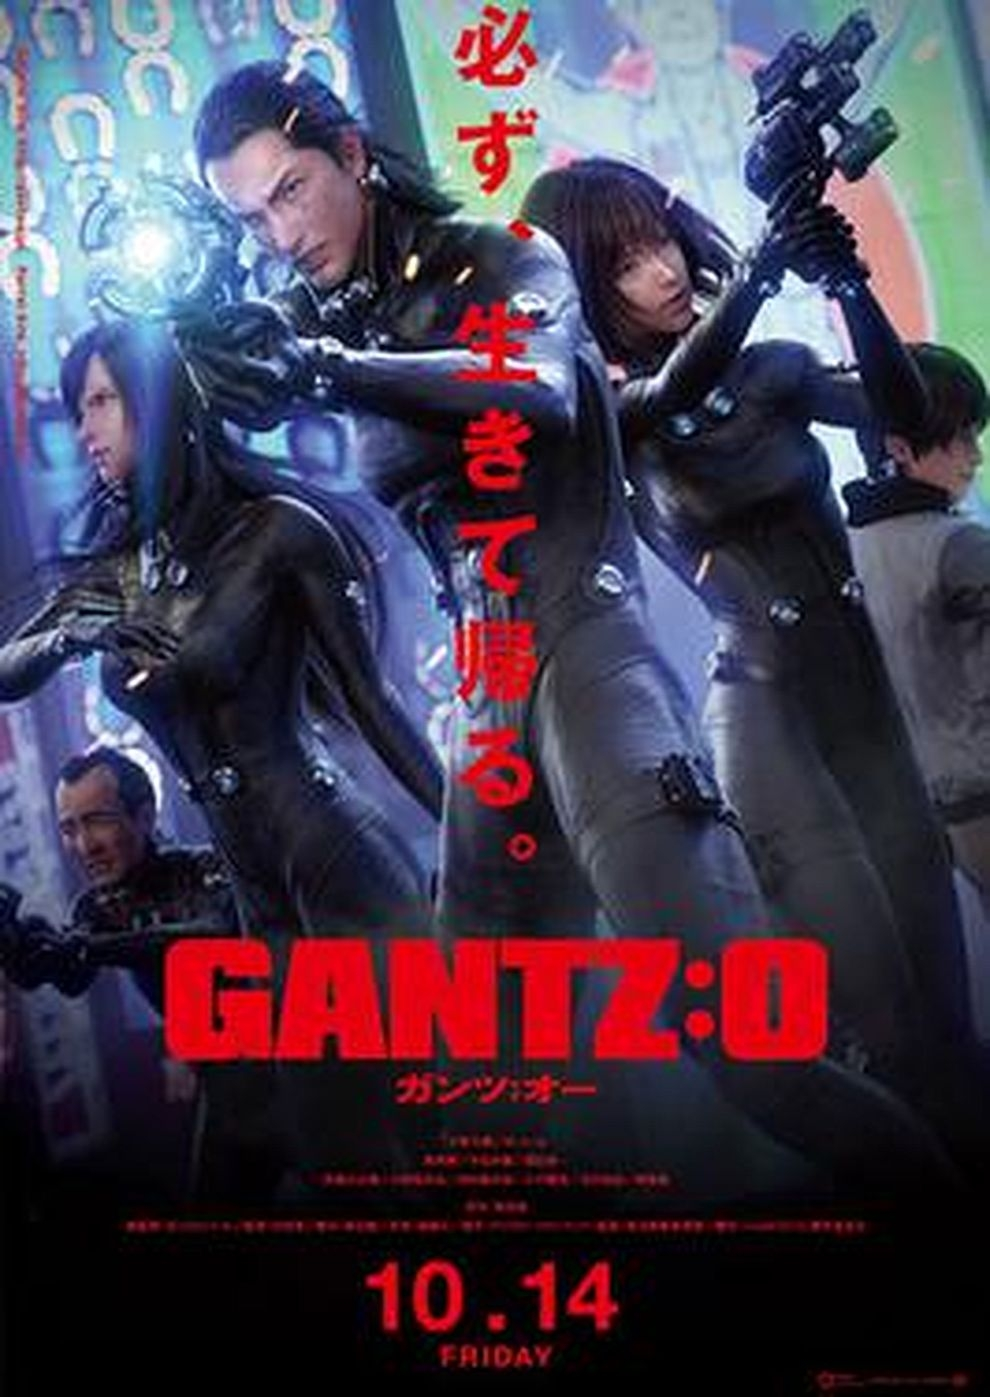 Anime Night 2019: Gantz:0 (Poster)